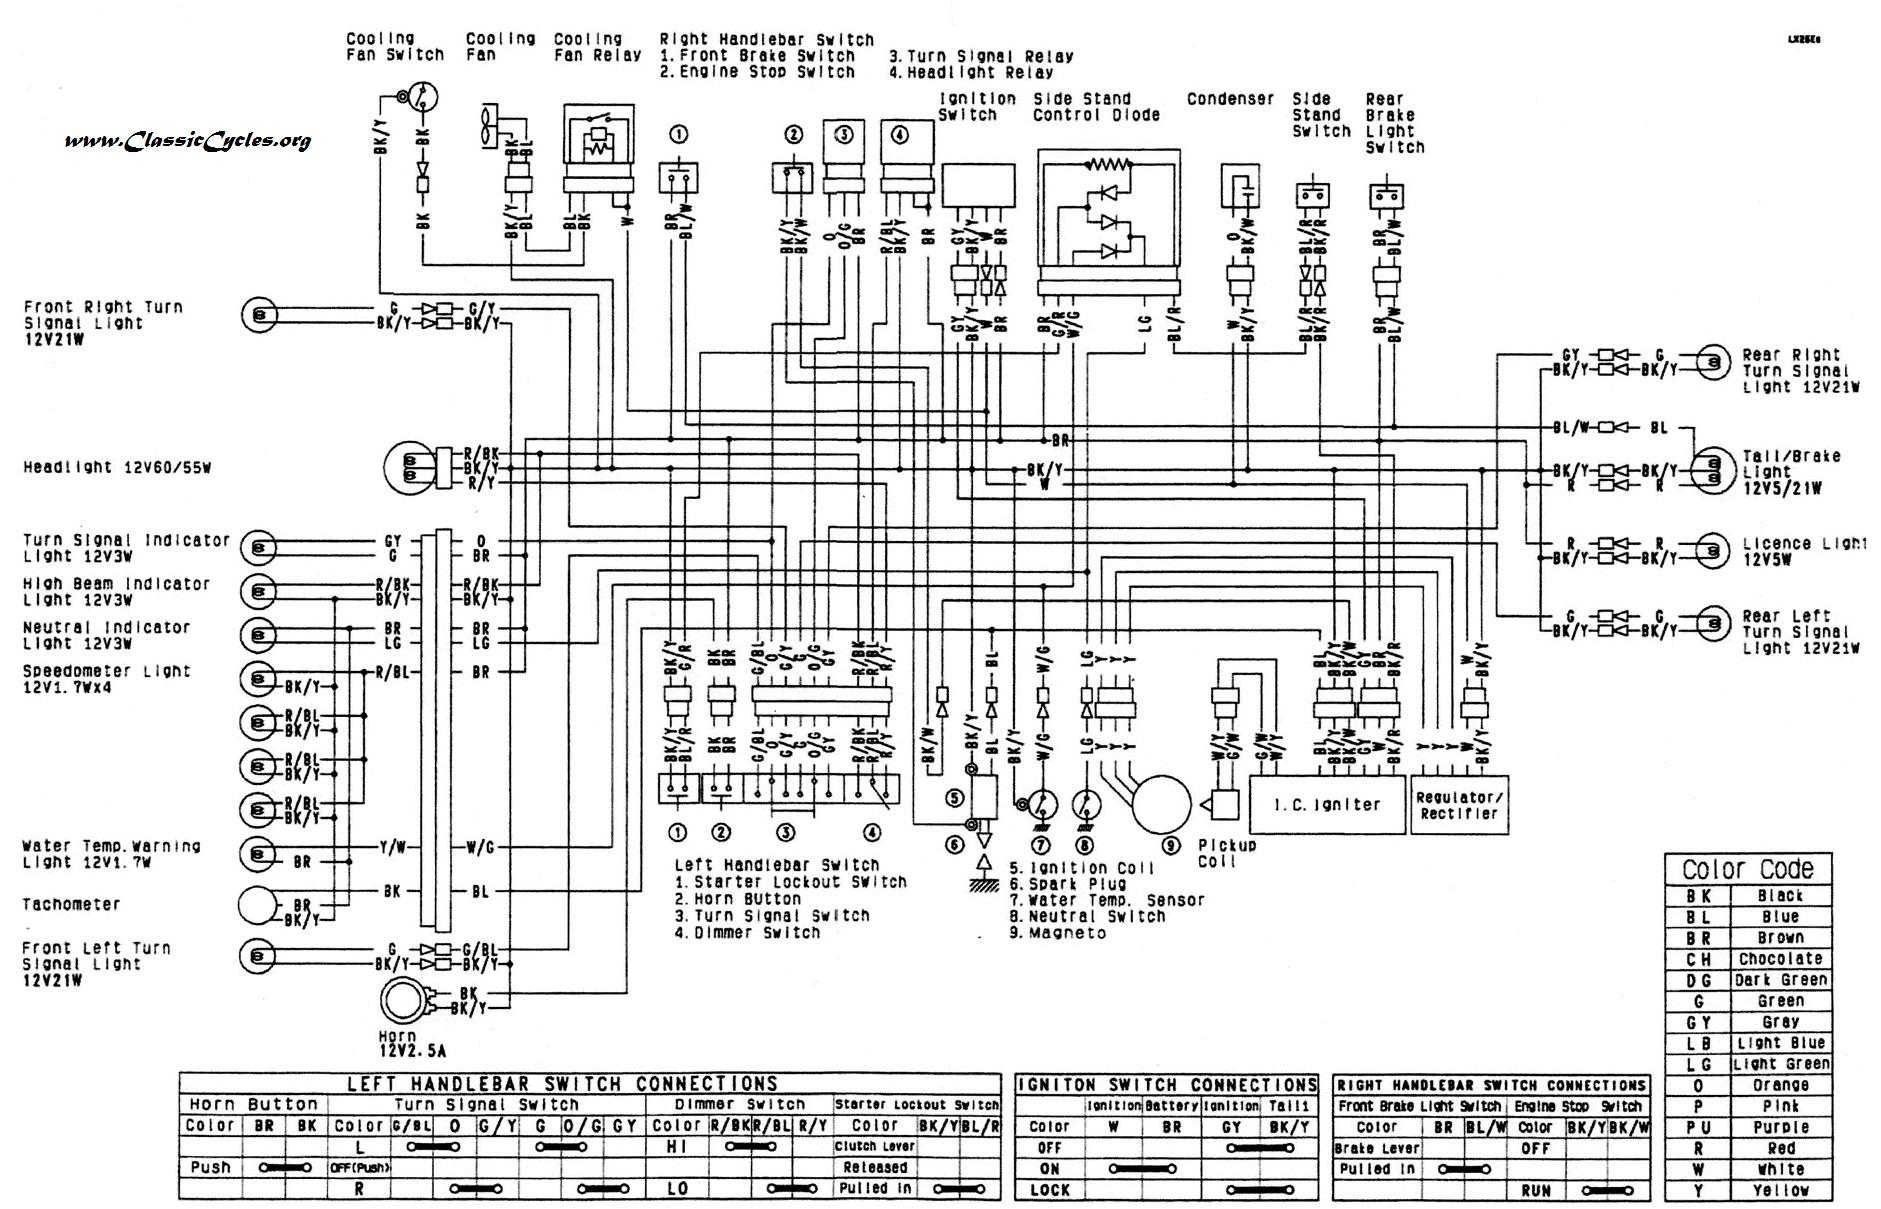 Fantastic Klx 650 Wiring Diagram Wiring Diagram Wiring Cloud Loplapiotaidewilluminateatxorg